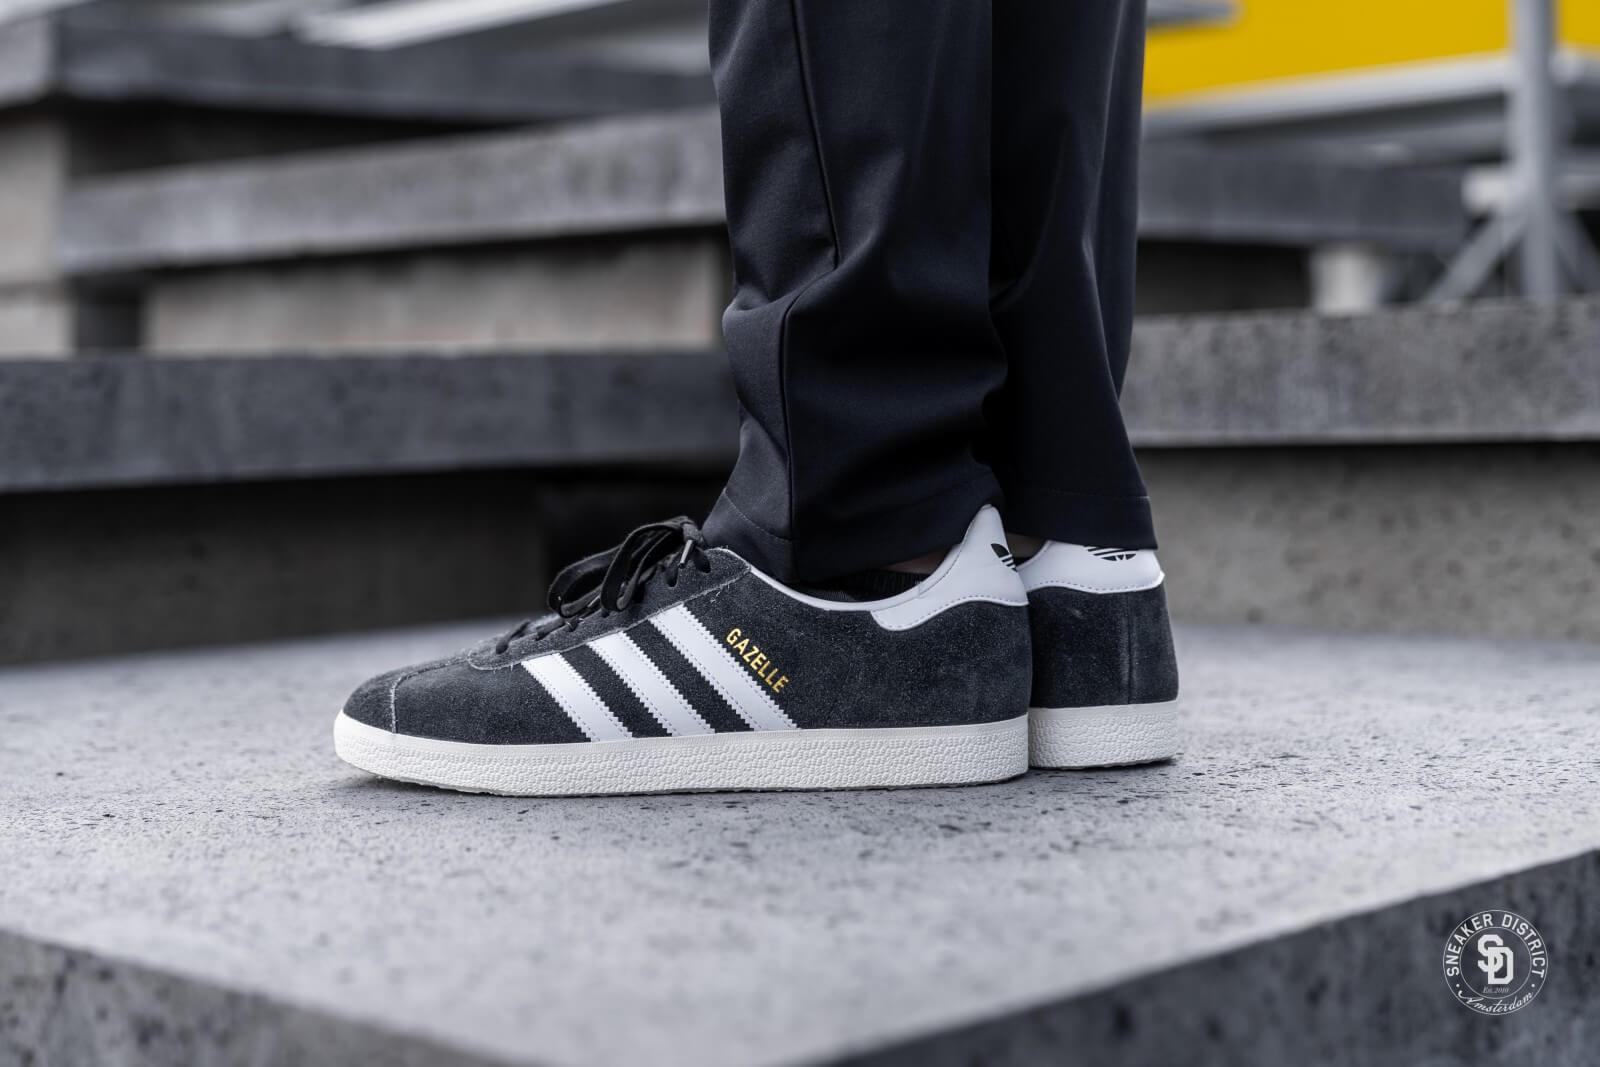 total Nueva Zelanda Invalidez  Adidas Gazelle Core Black/Footwear White - BD7591